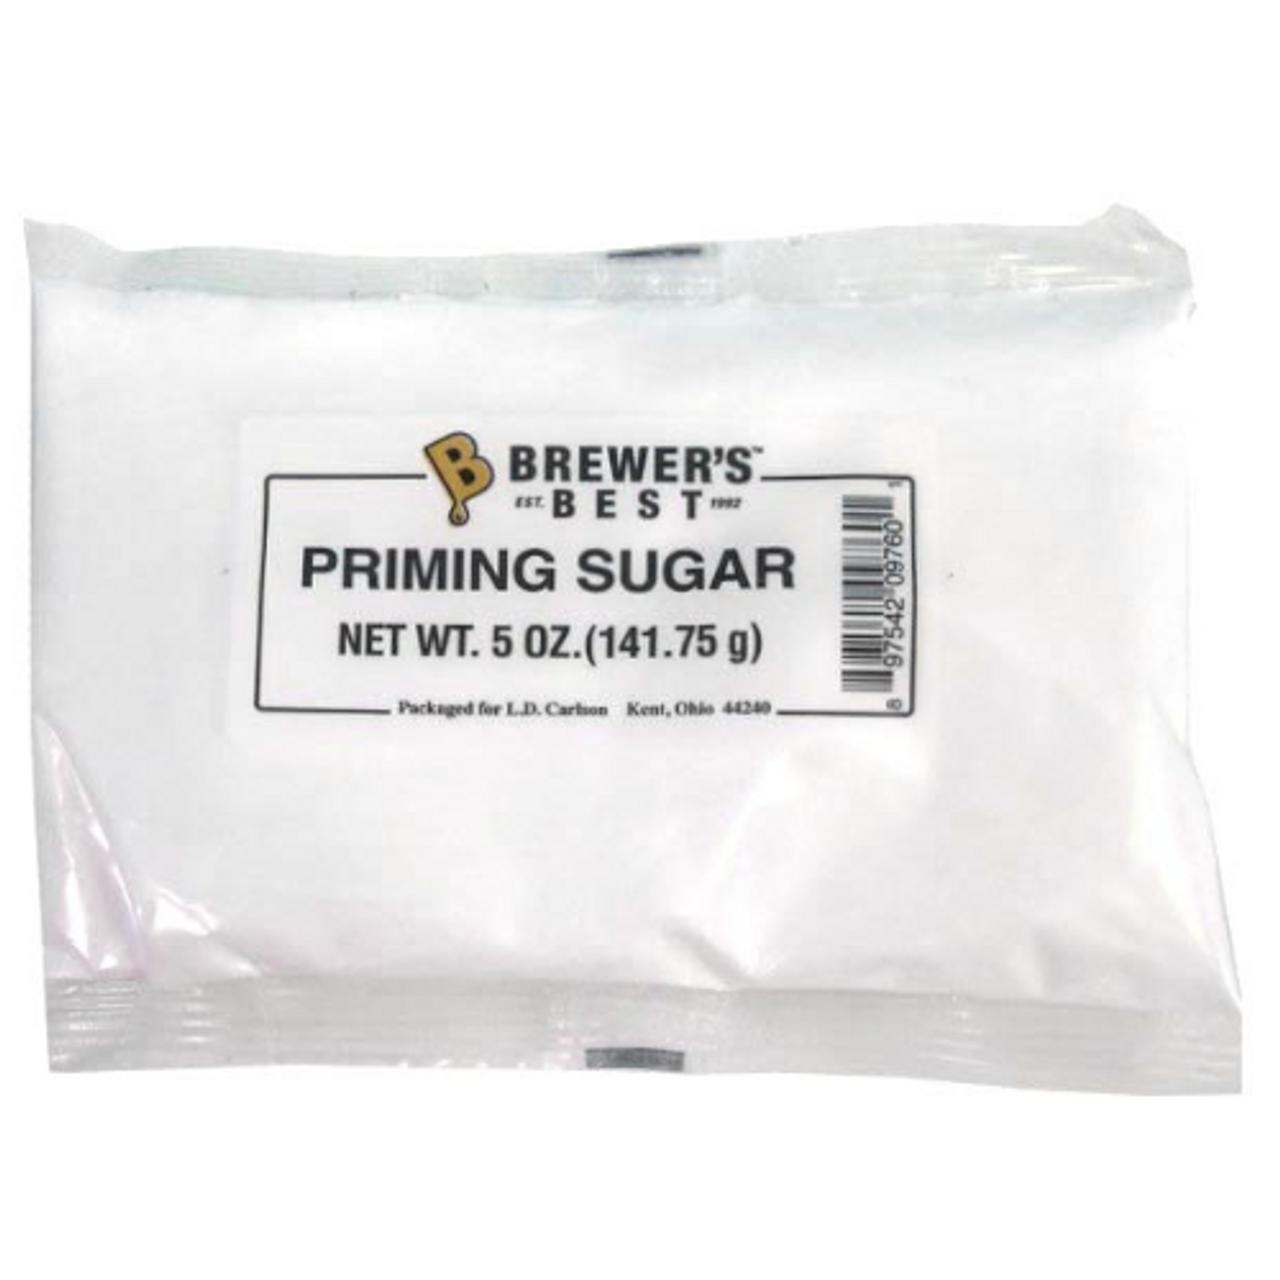 Priming Sugar & Corn Sugar